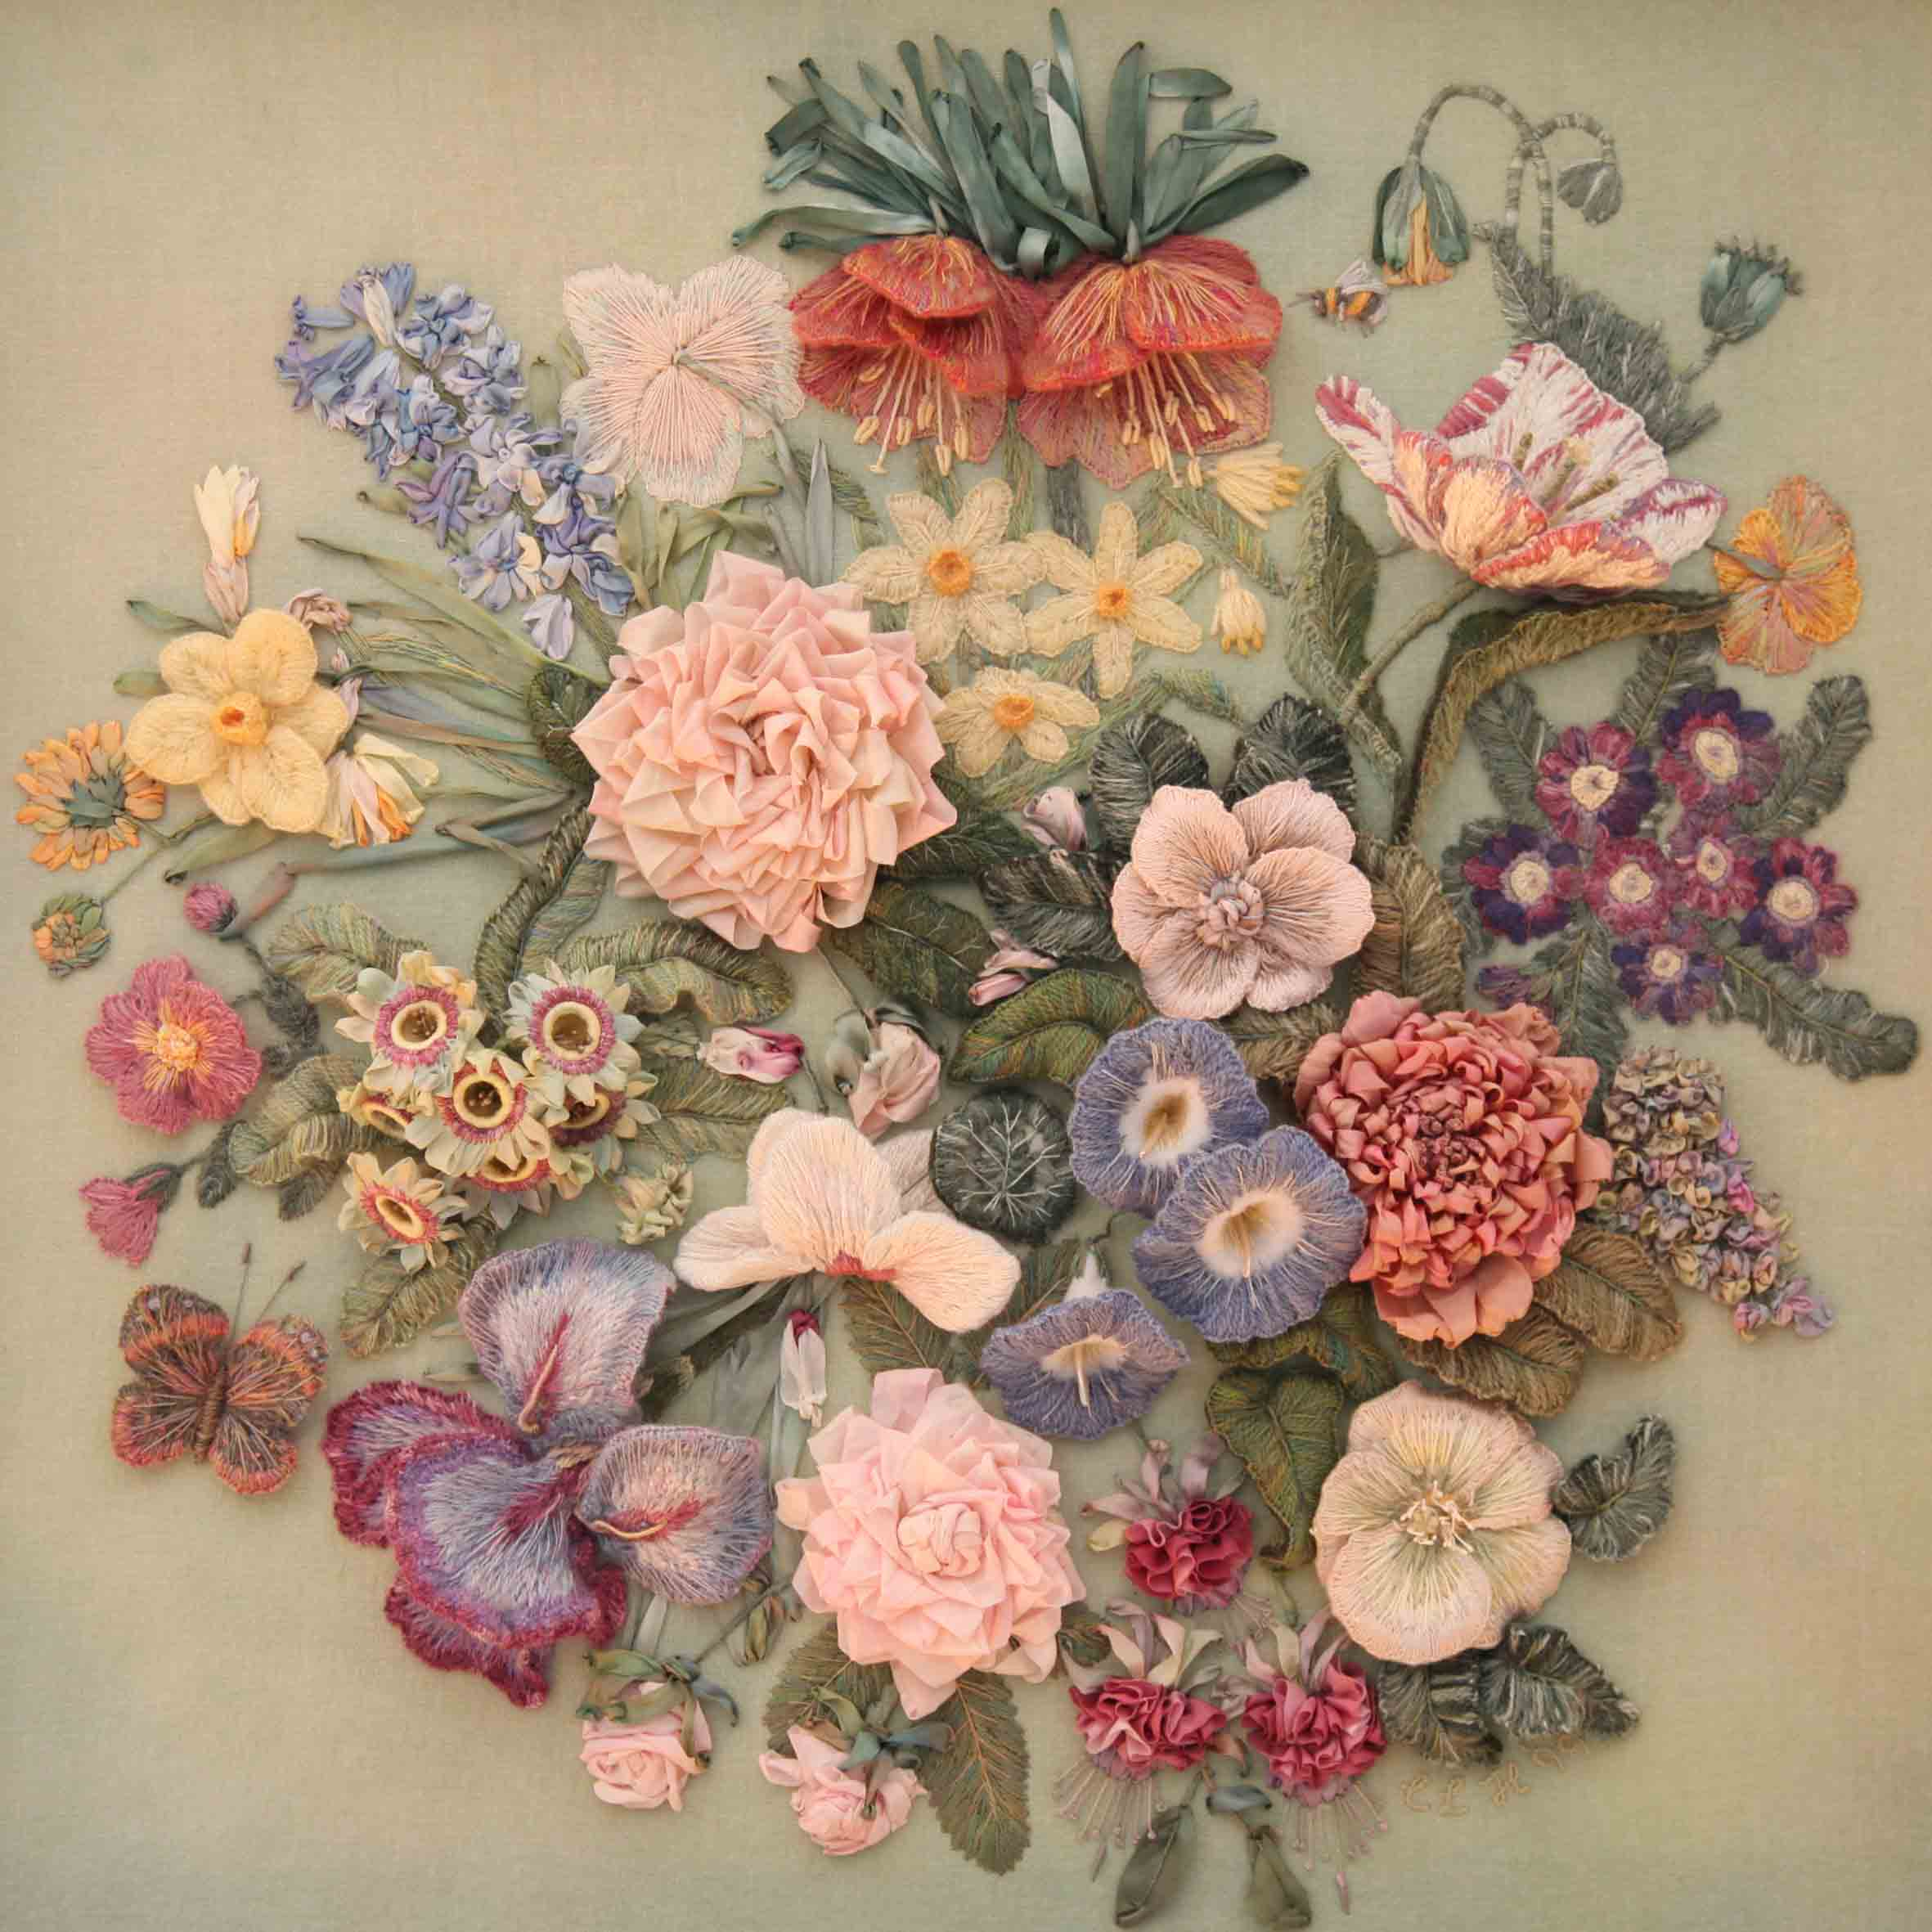 Catherine Howell -Flemish Still Life